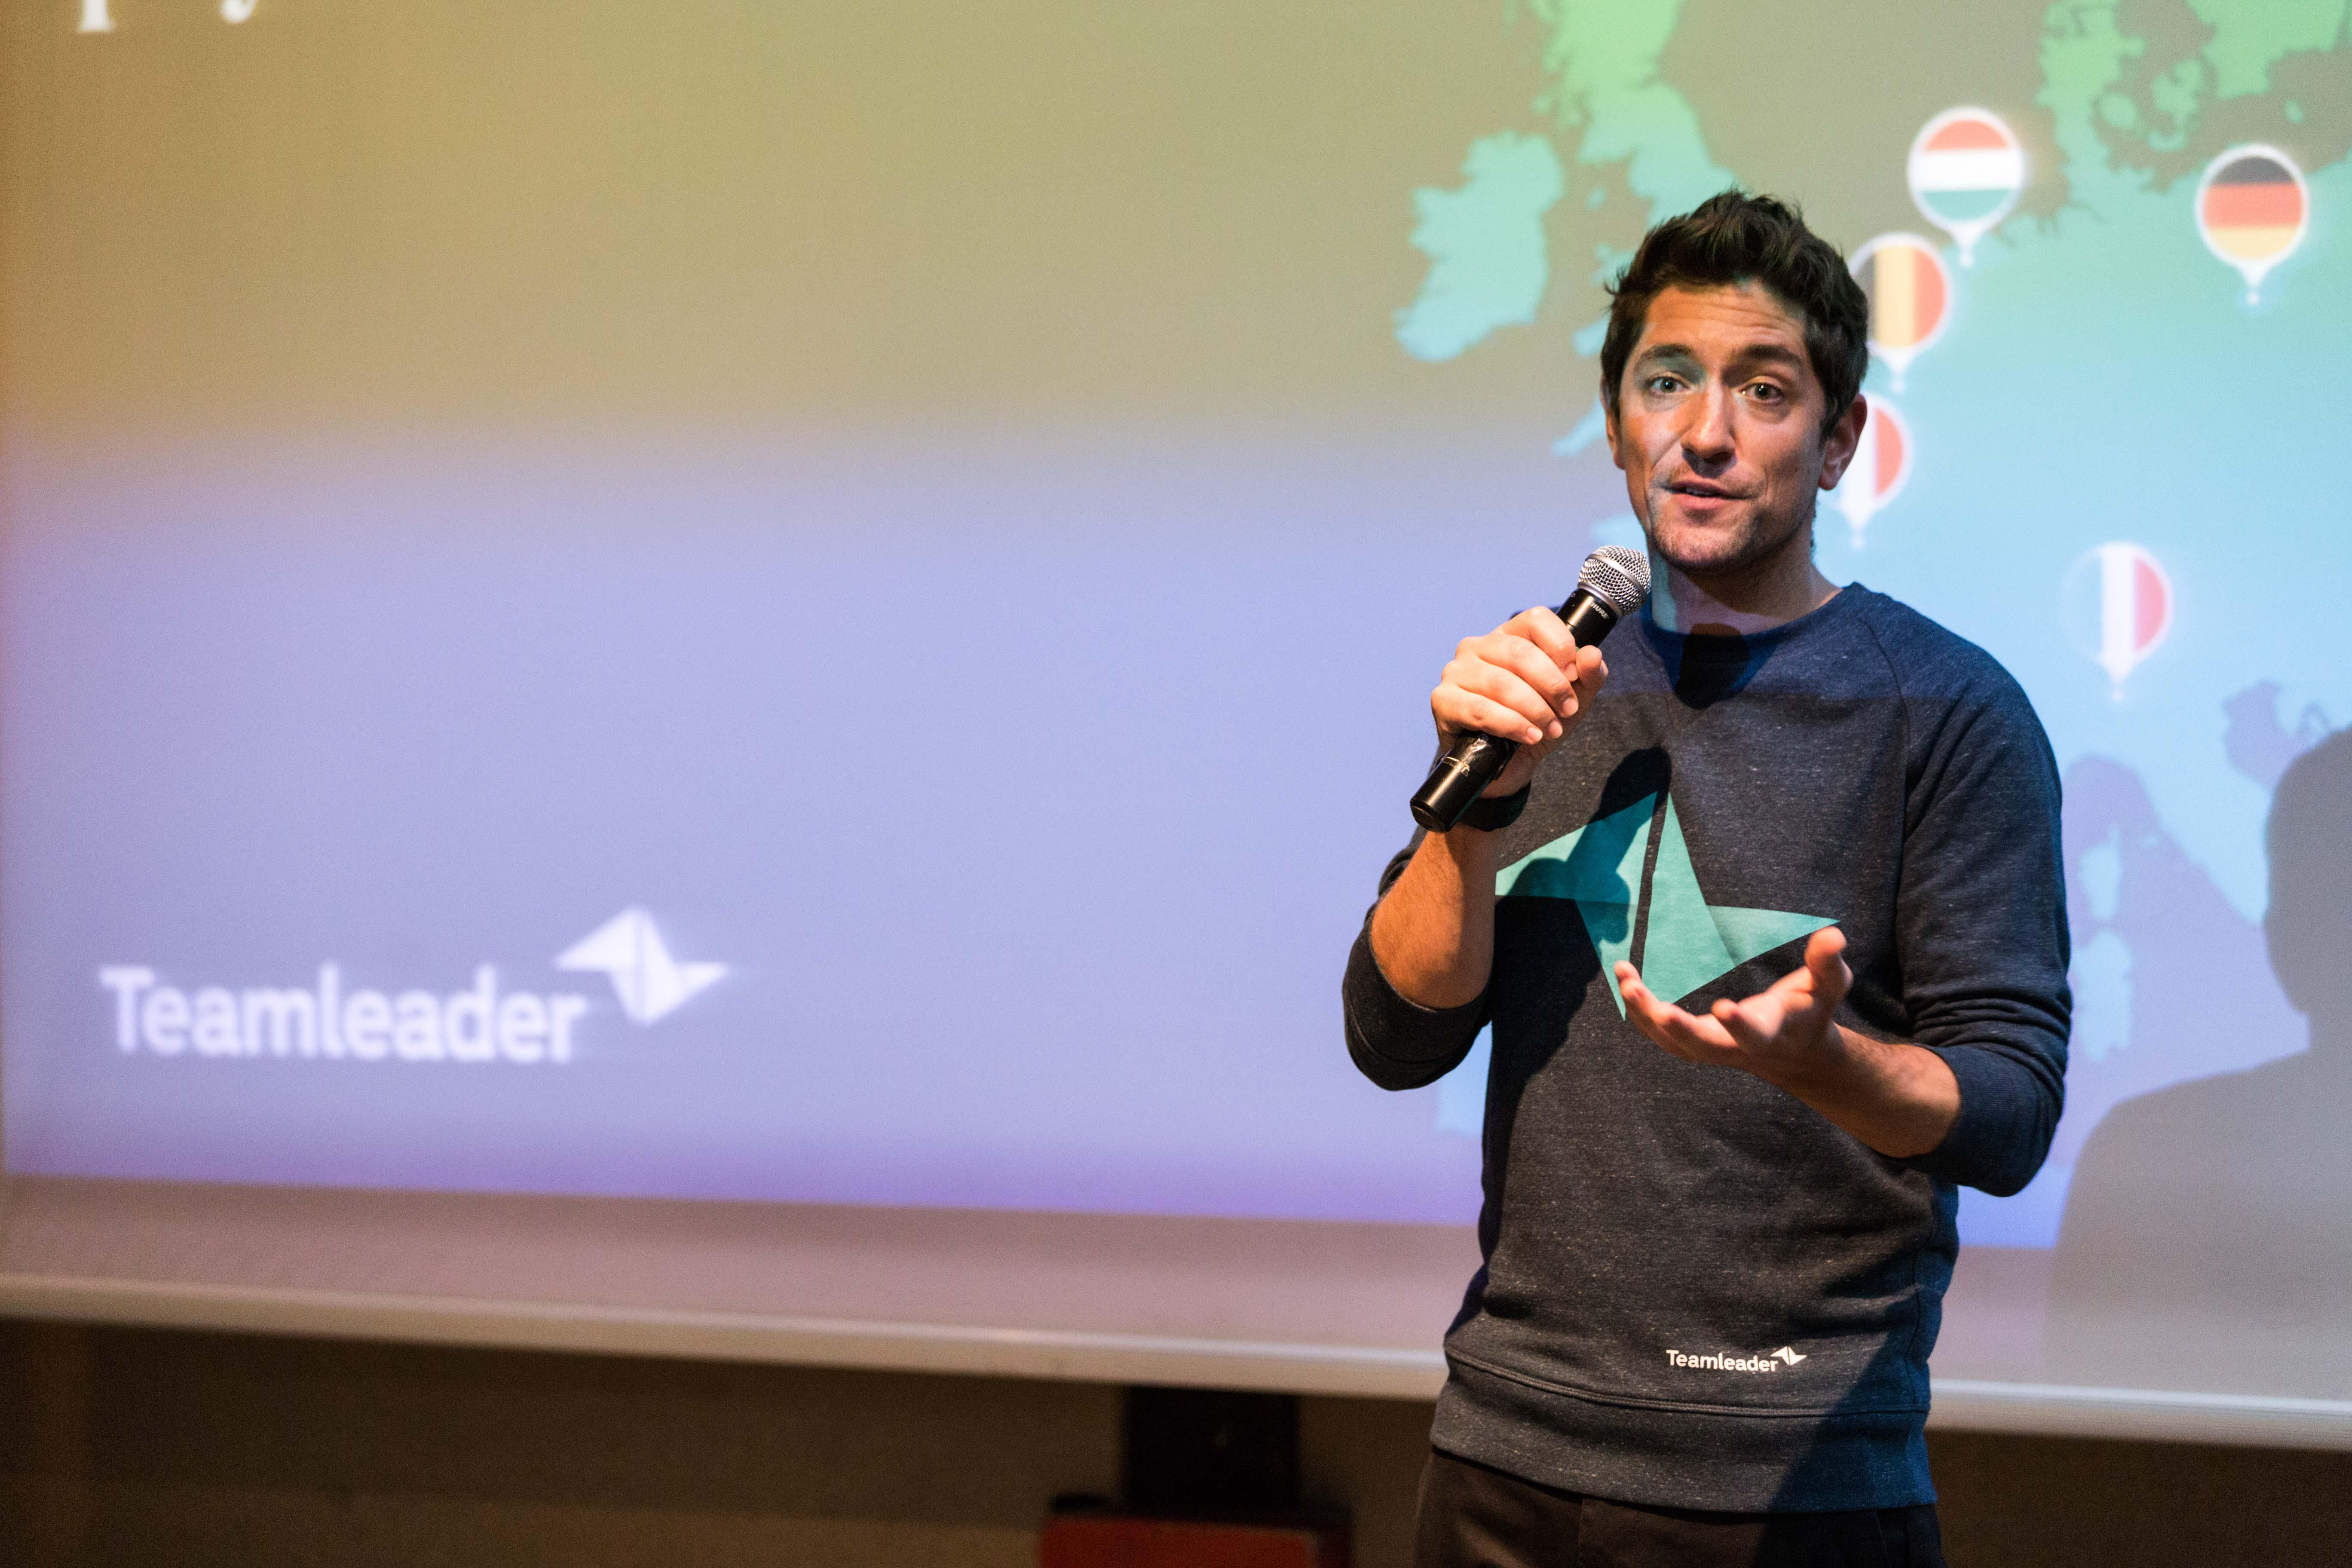 Guillaume-Broutart-lancement-Teamleader-France.jpg